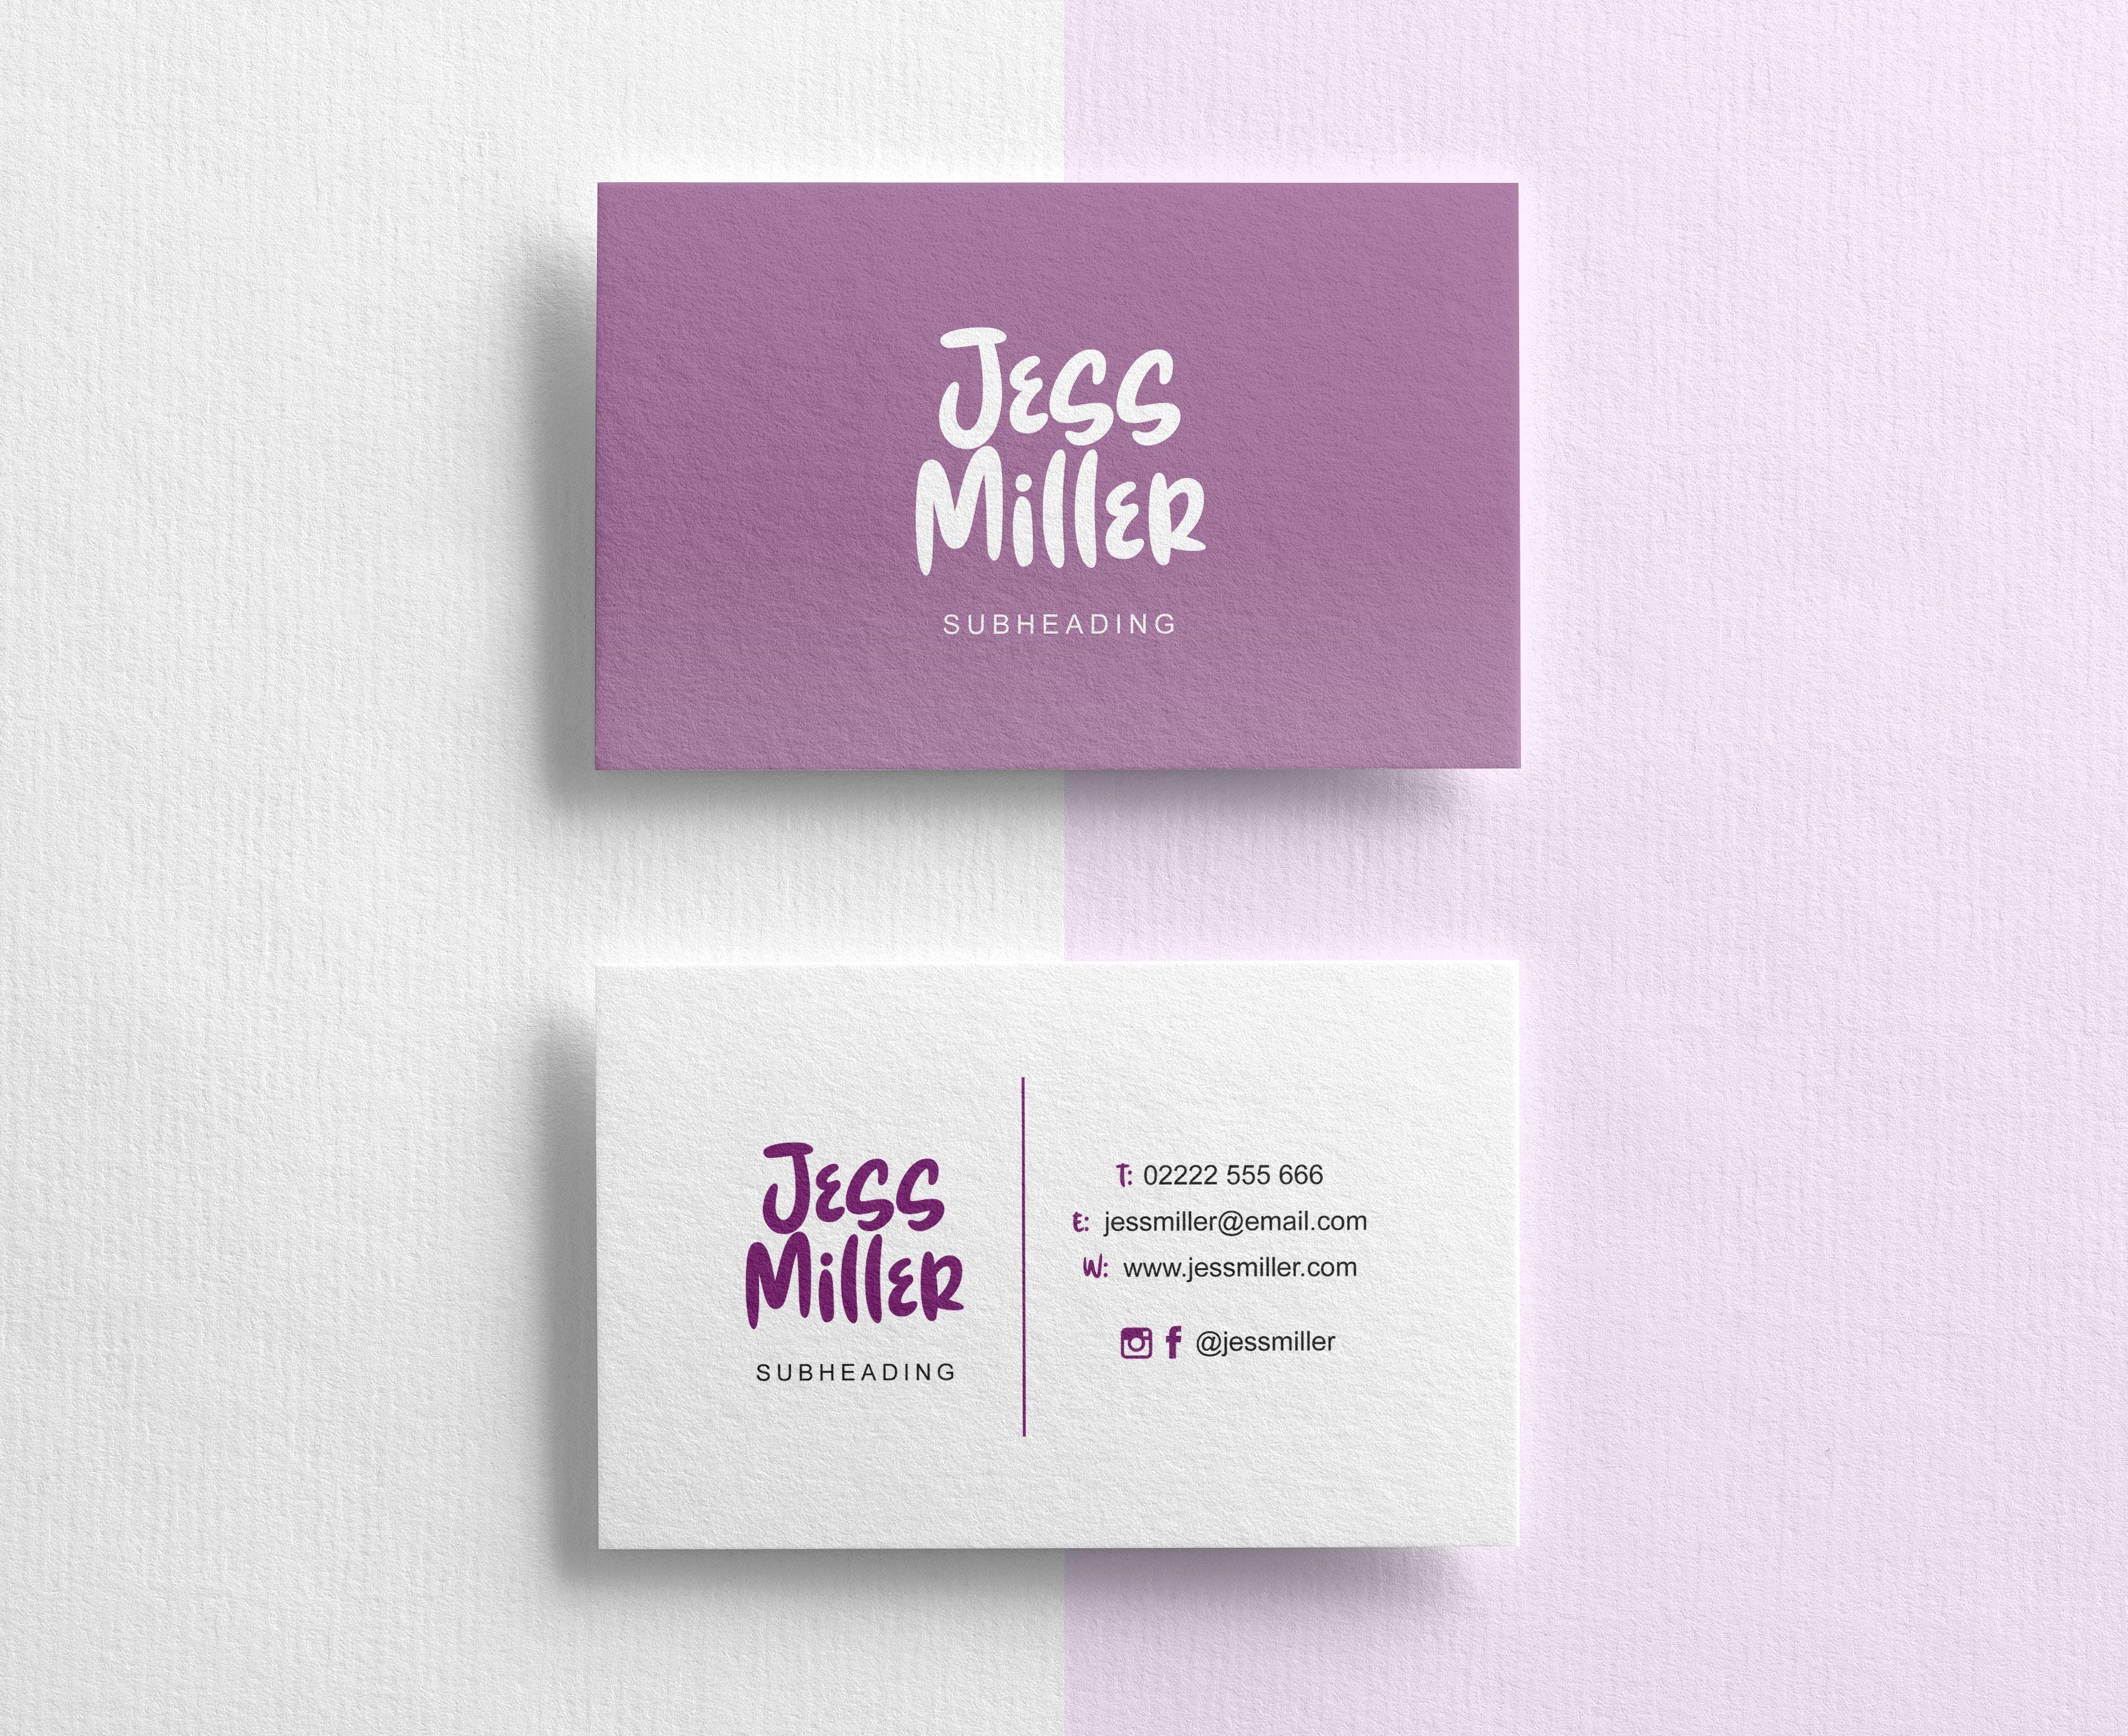 Custom Purple Business Cards Business Stationery Print Design Business Card Design Custom Business Cards Business Stationery